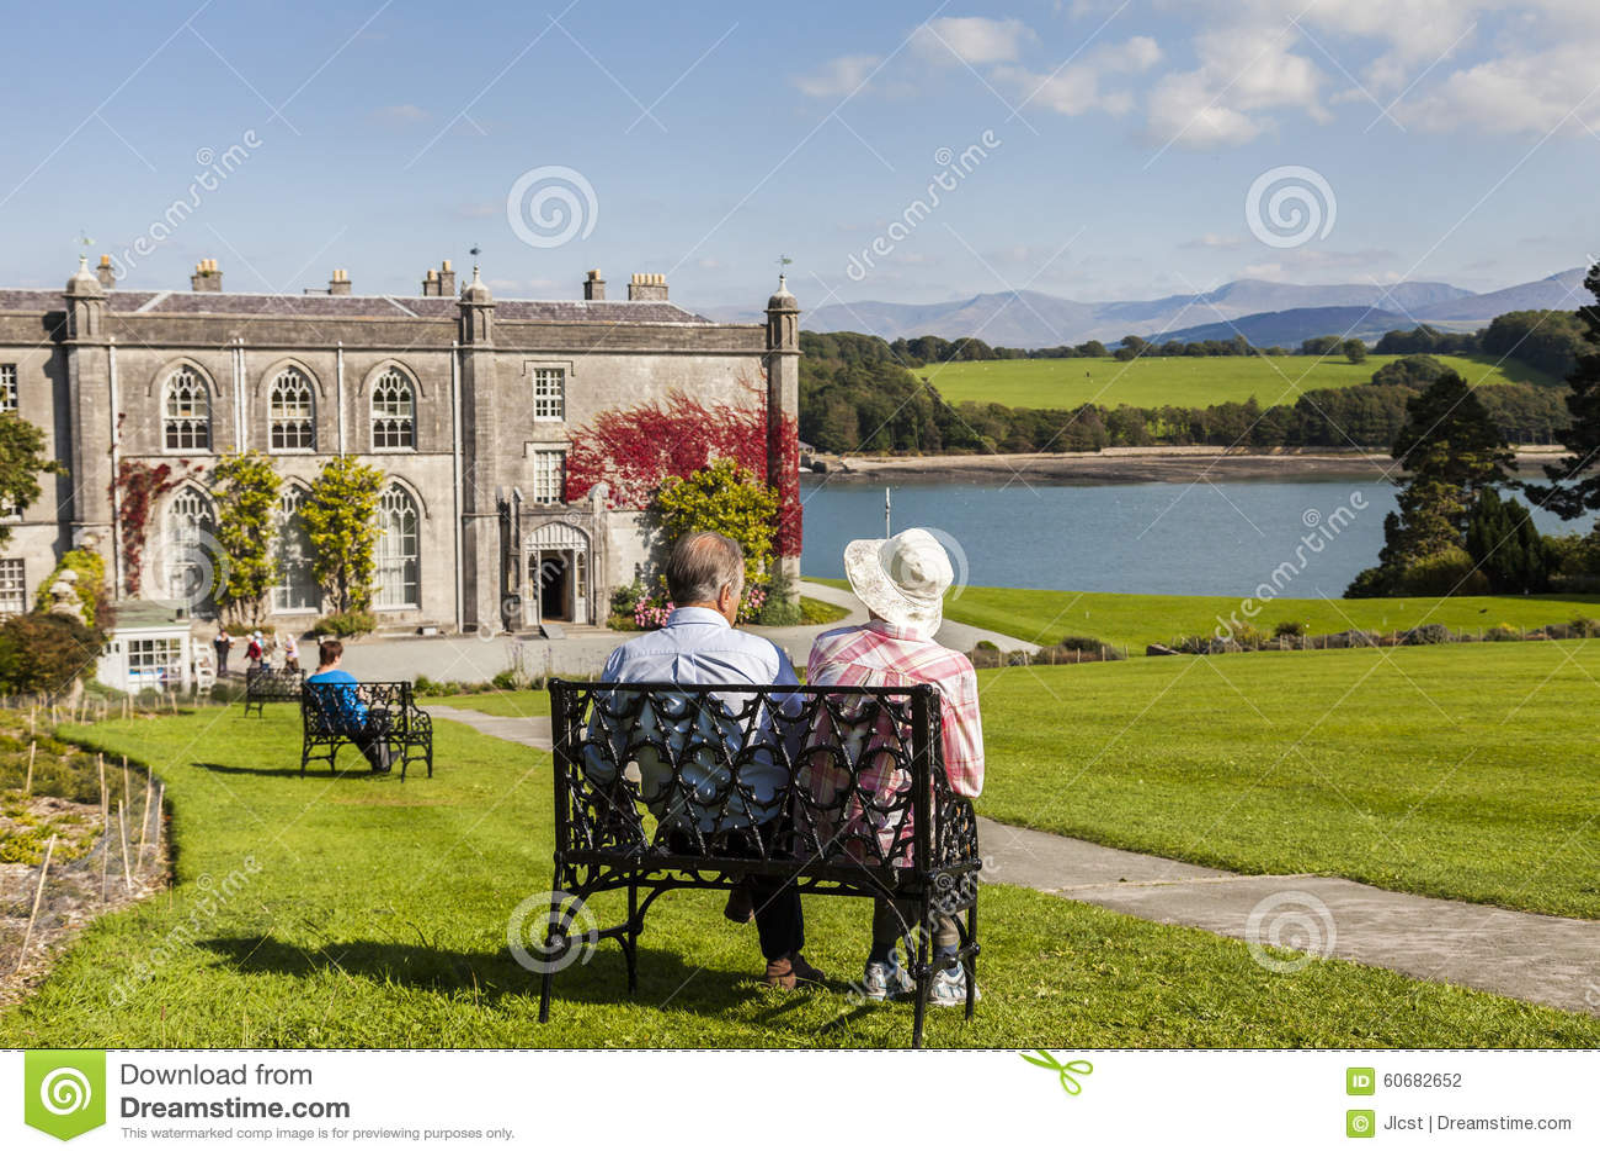 Anglesey, Ουαλία UK 8 Σεπτεμβρίου 2015 Συνταξιούχο ζεύγος που απολαμβάνει τη θέα στο εξοχικό σπίτι και τους κήπους Plas Newydd